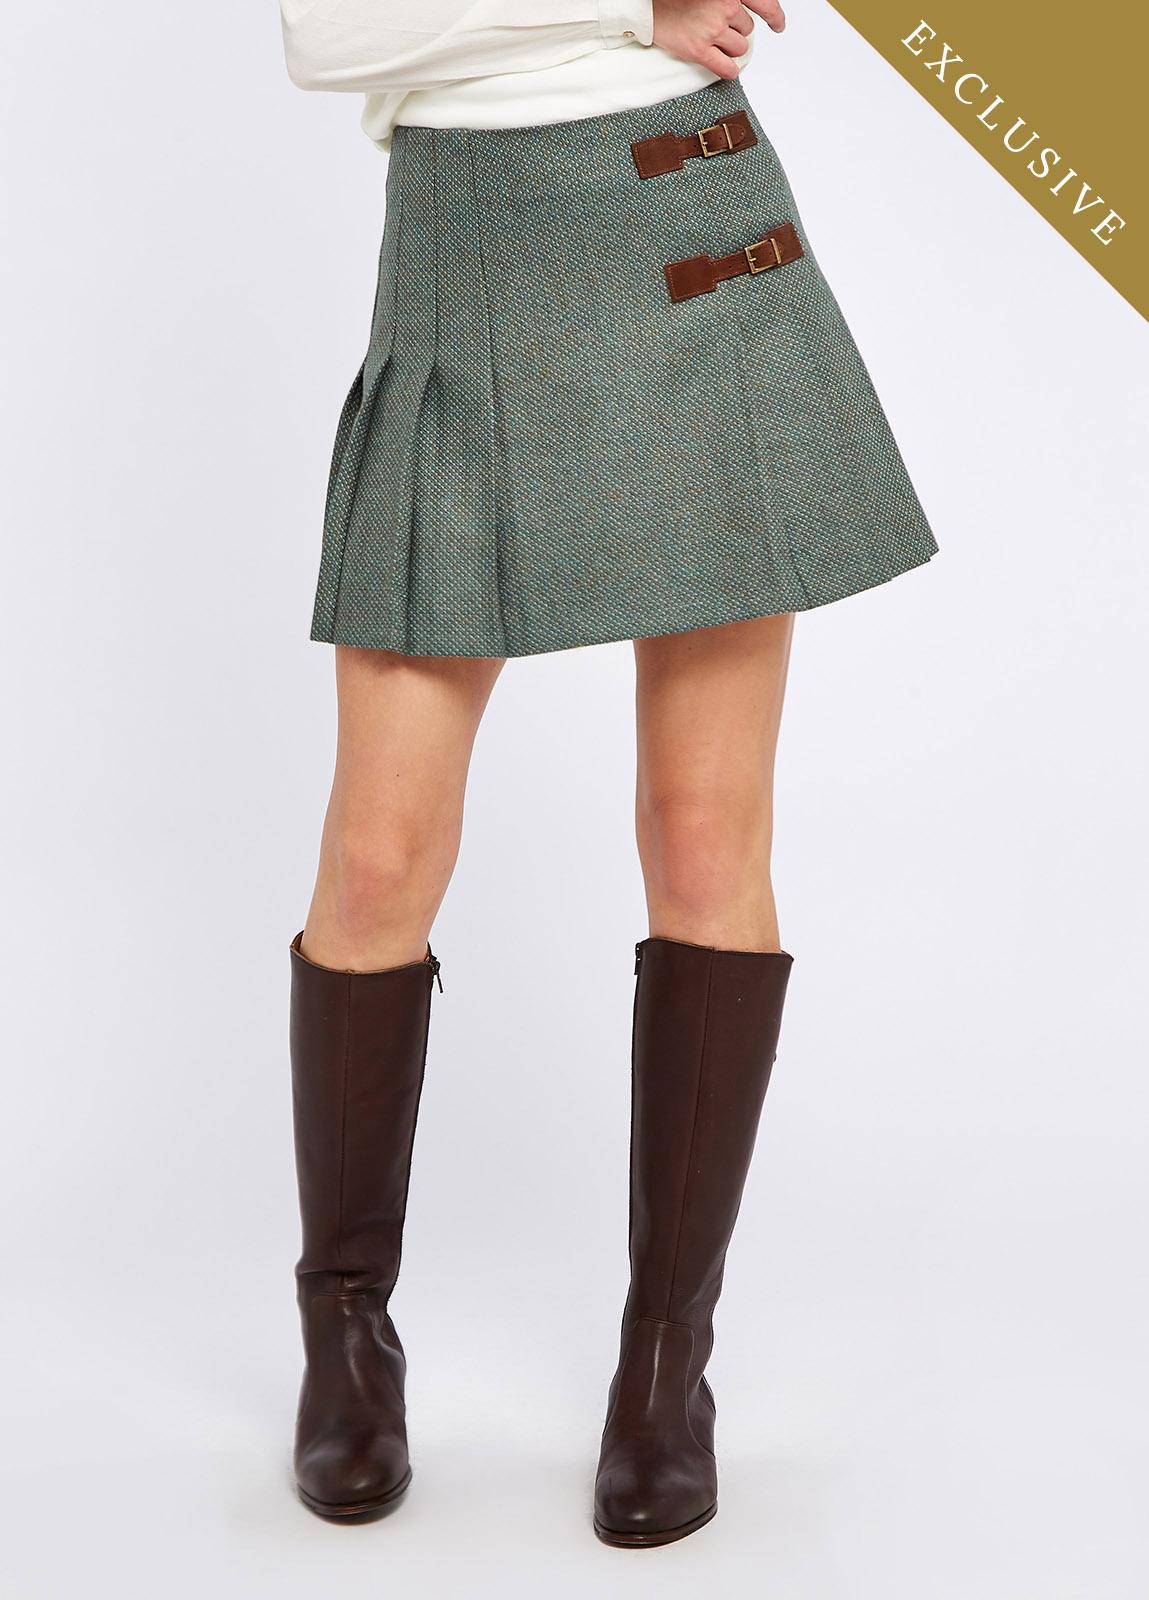 Blossom Tweed Skirt - Rowan